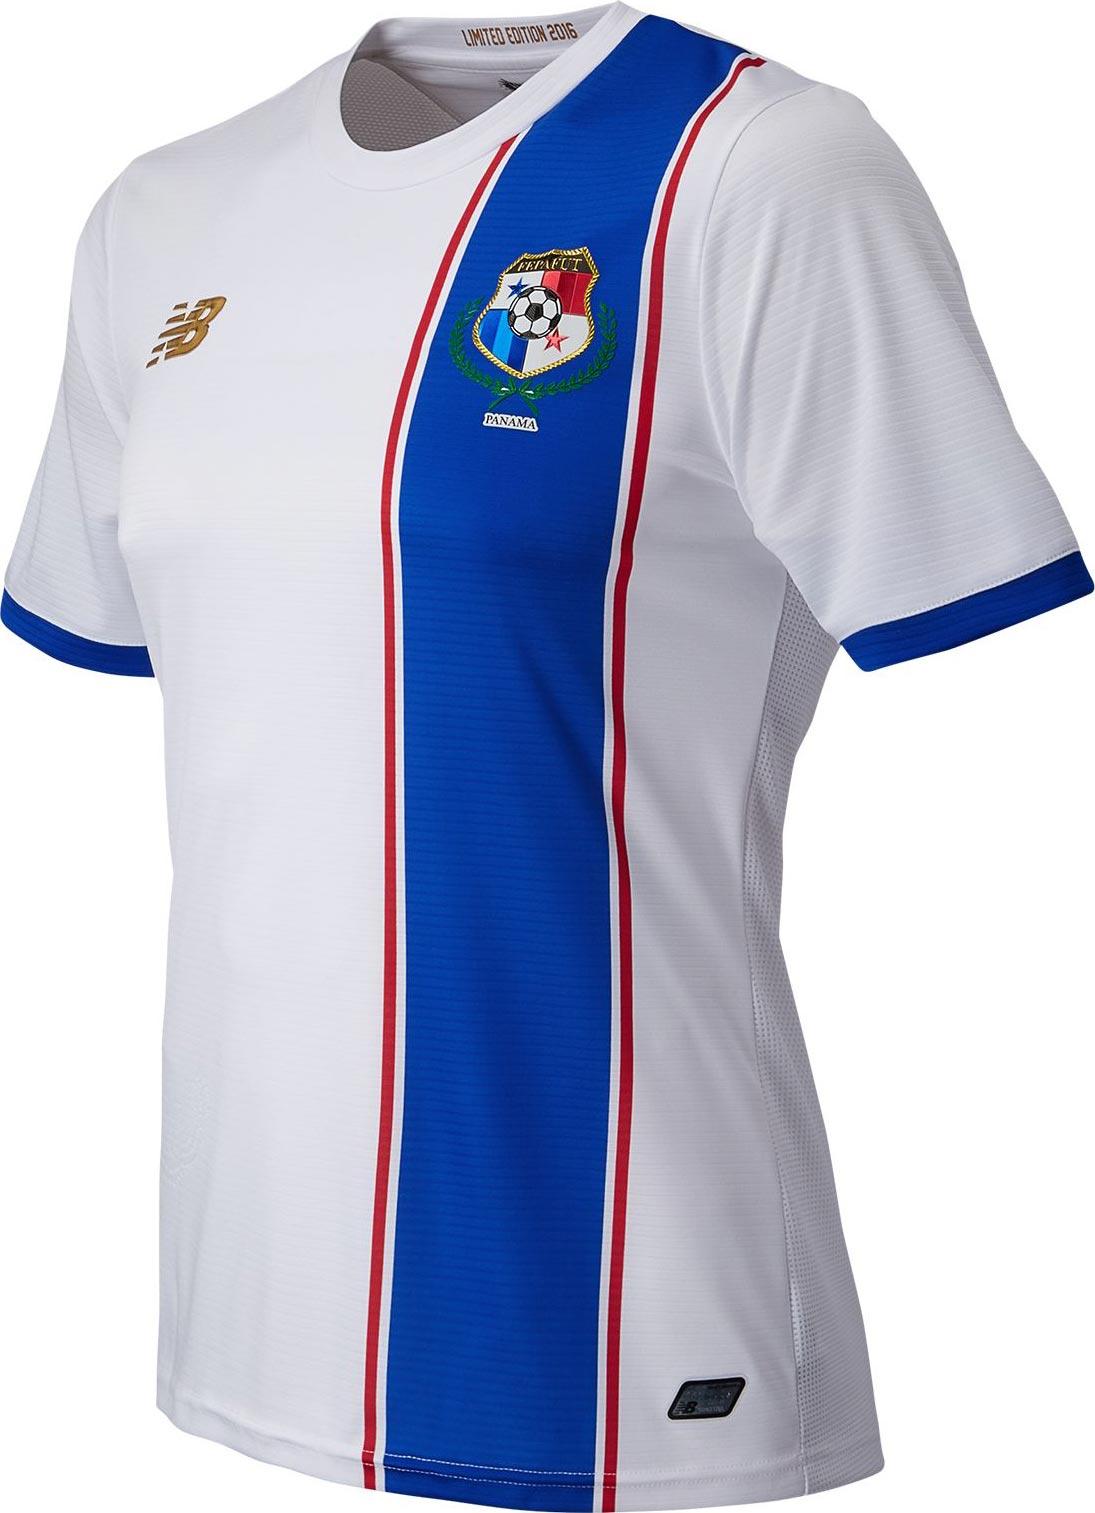 Image gallery panama jersey 2016 for Cuarto kit del america 2018